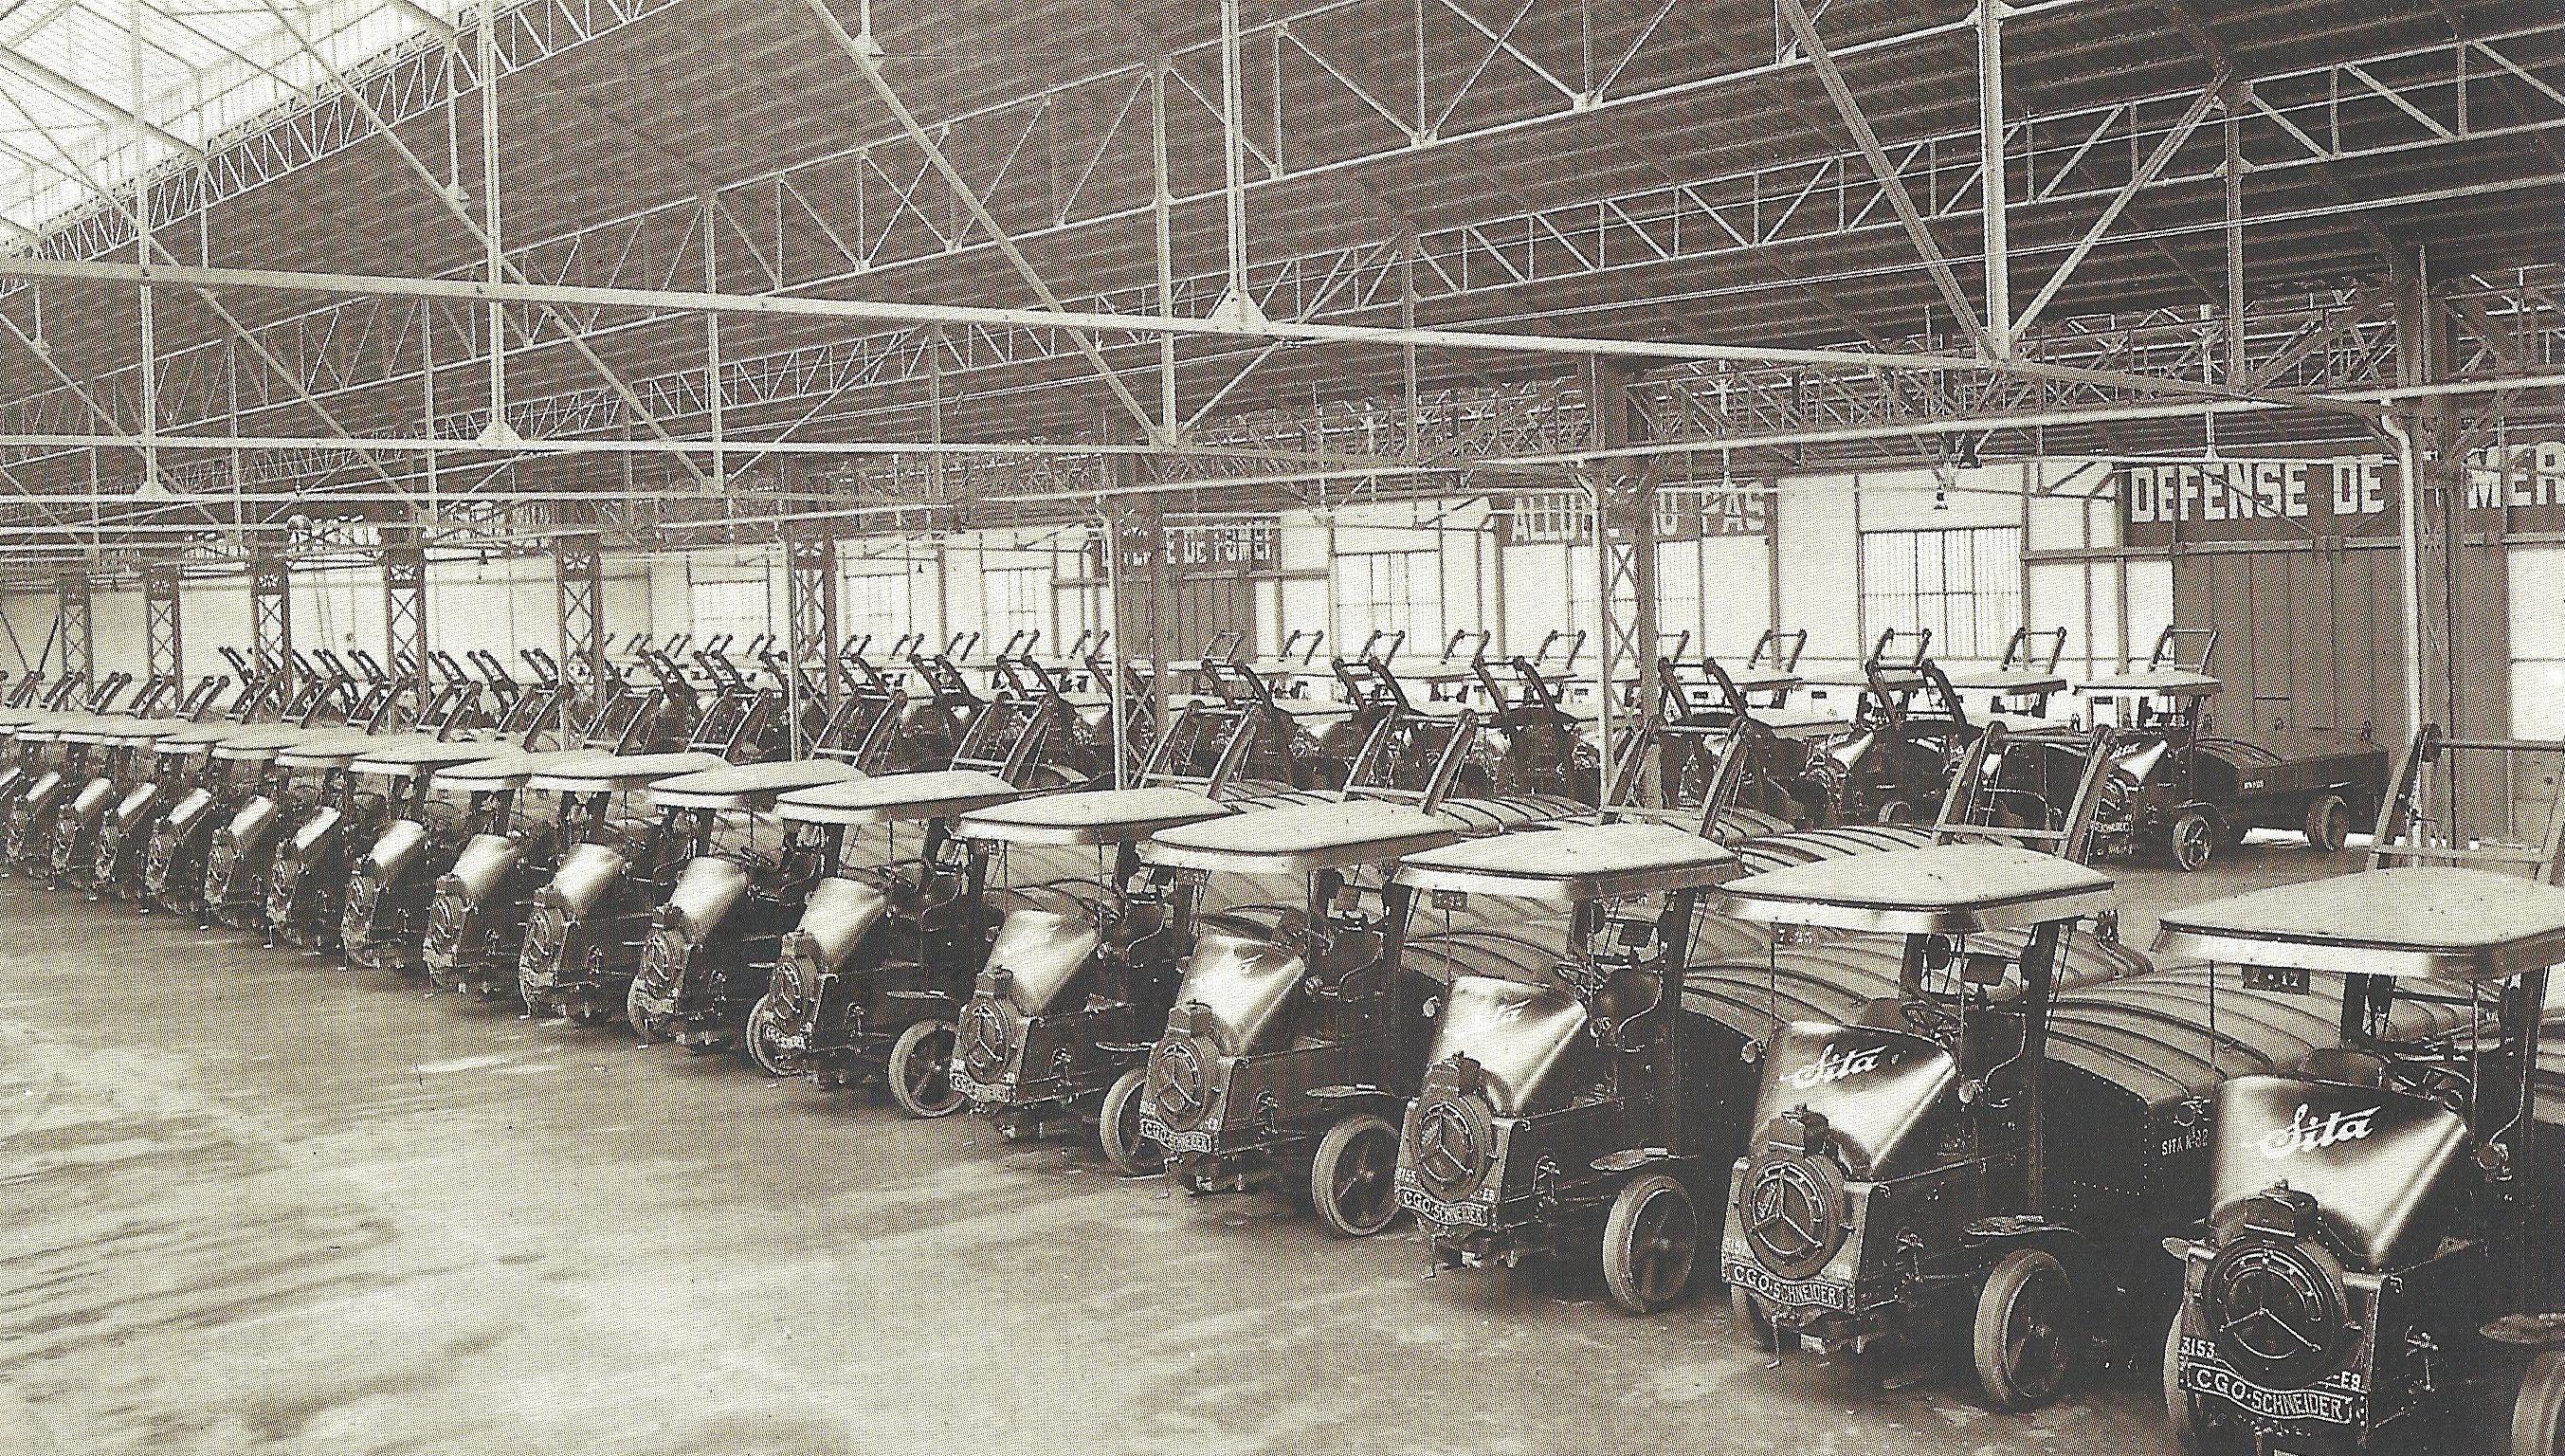 Sita-CGO-Schneider-vuilniswagens-van-Sita-in-de-Issy-les-Moulineaux-garage-in-1925